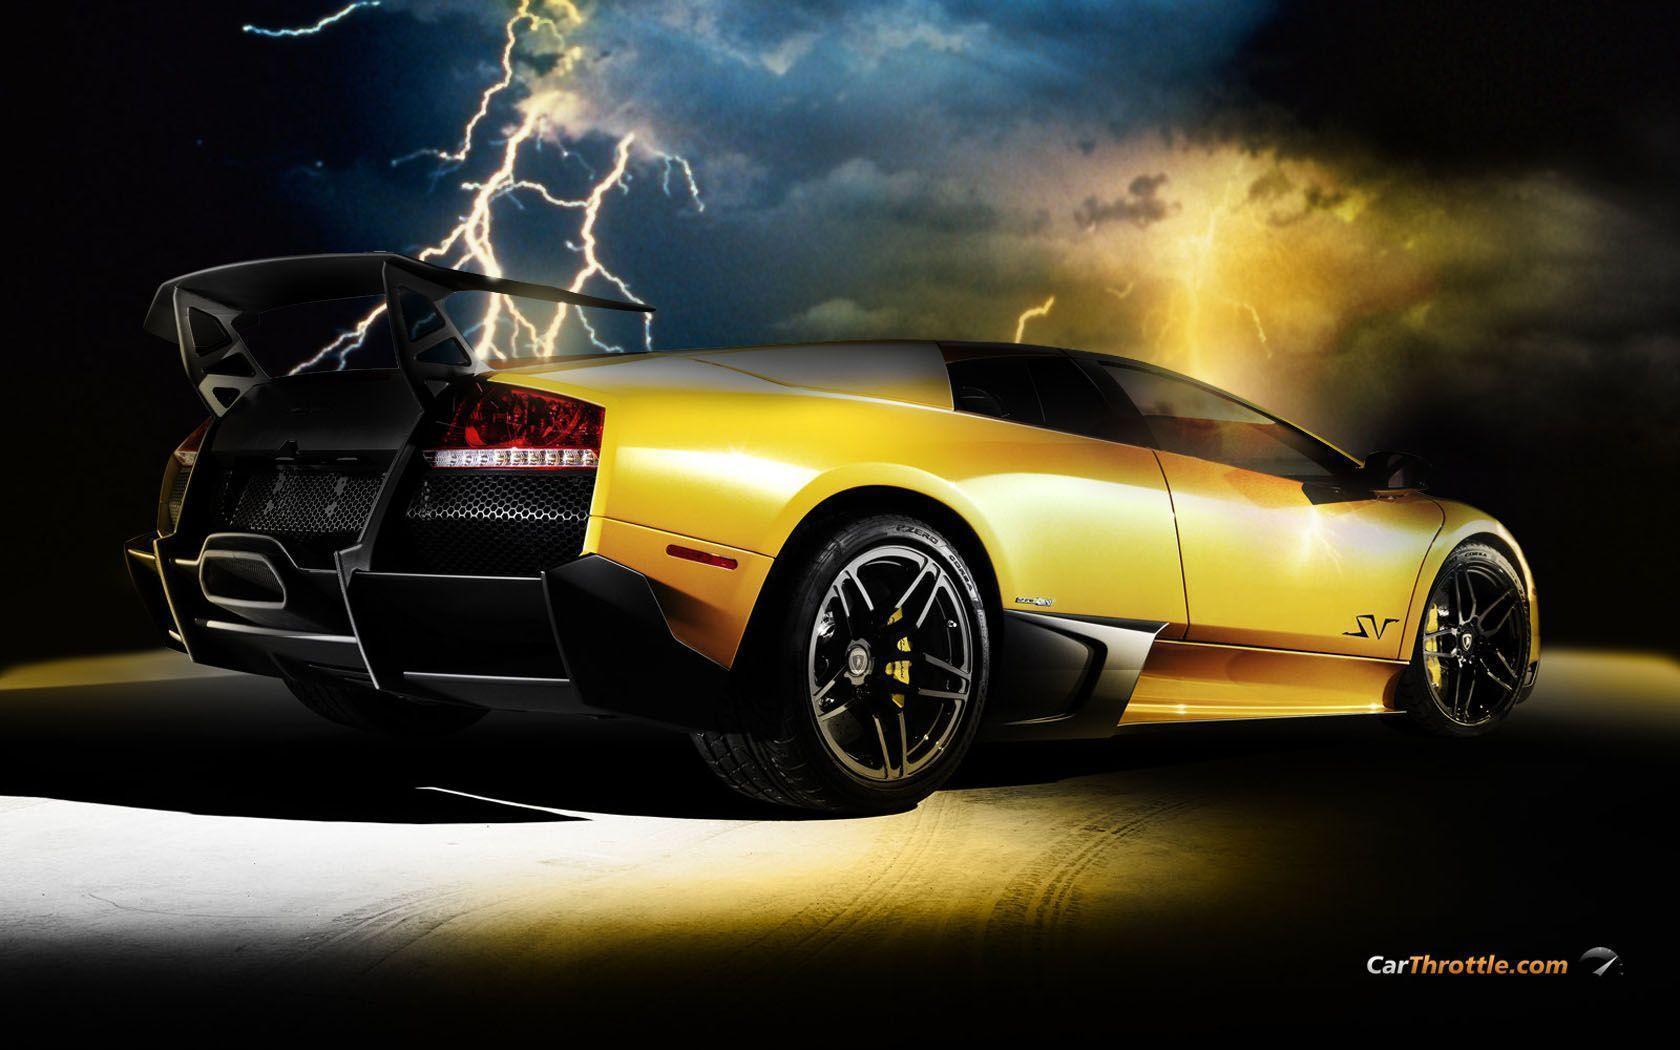 Awesome Lamborghini Wallpapers - Top